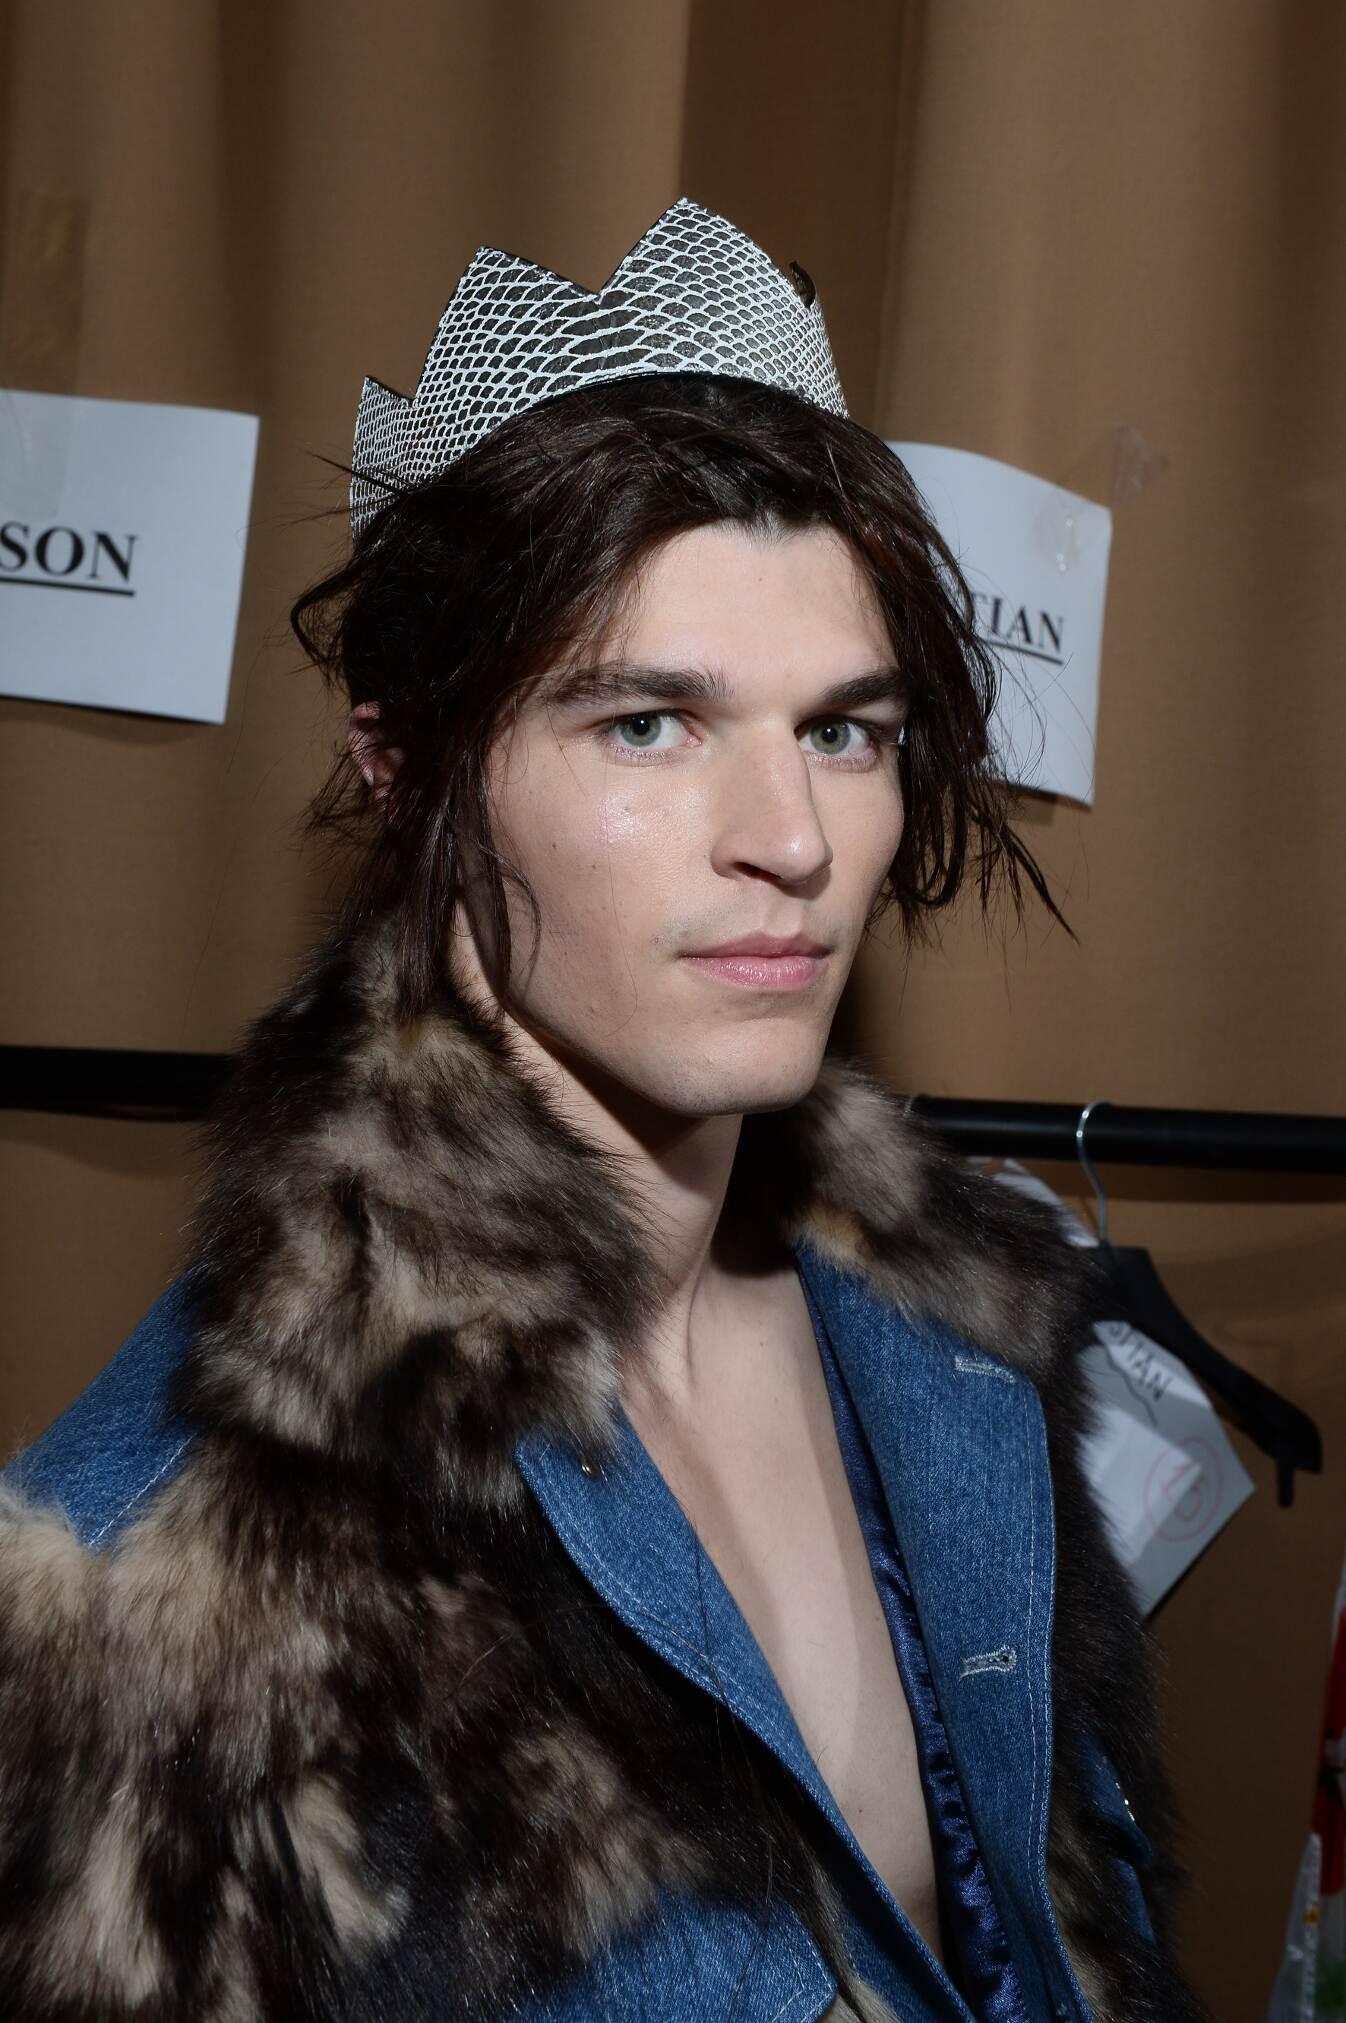 Backstage Moschino Man Model Fall 2015 London Fashion Week